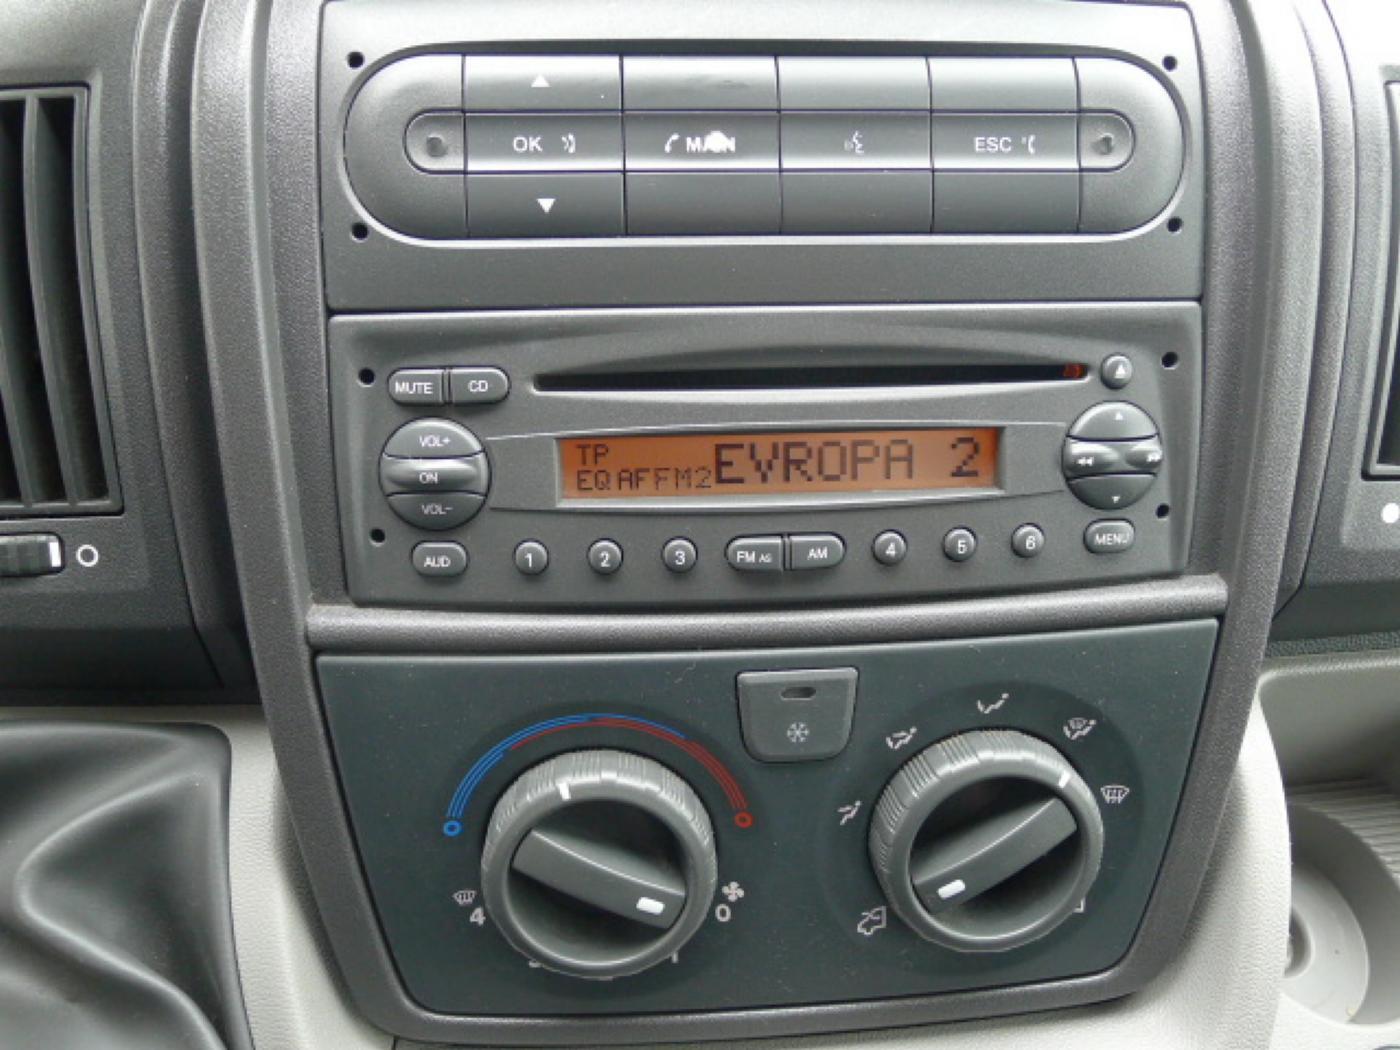 Peugeot Boxer 2.2 HDI L2H2 Klima Akce!!! Novinka - 10